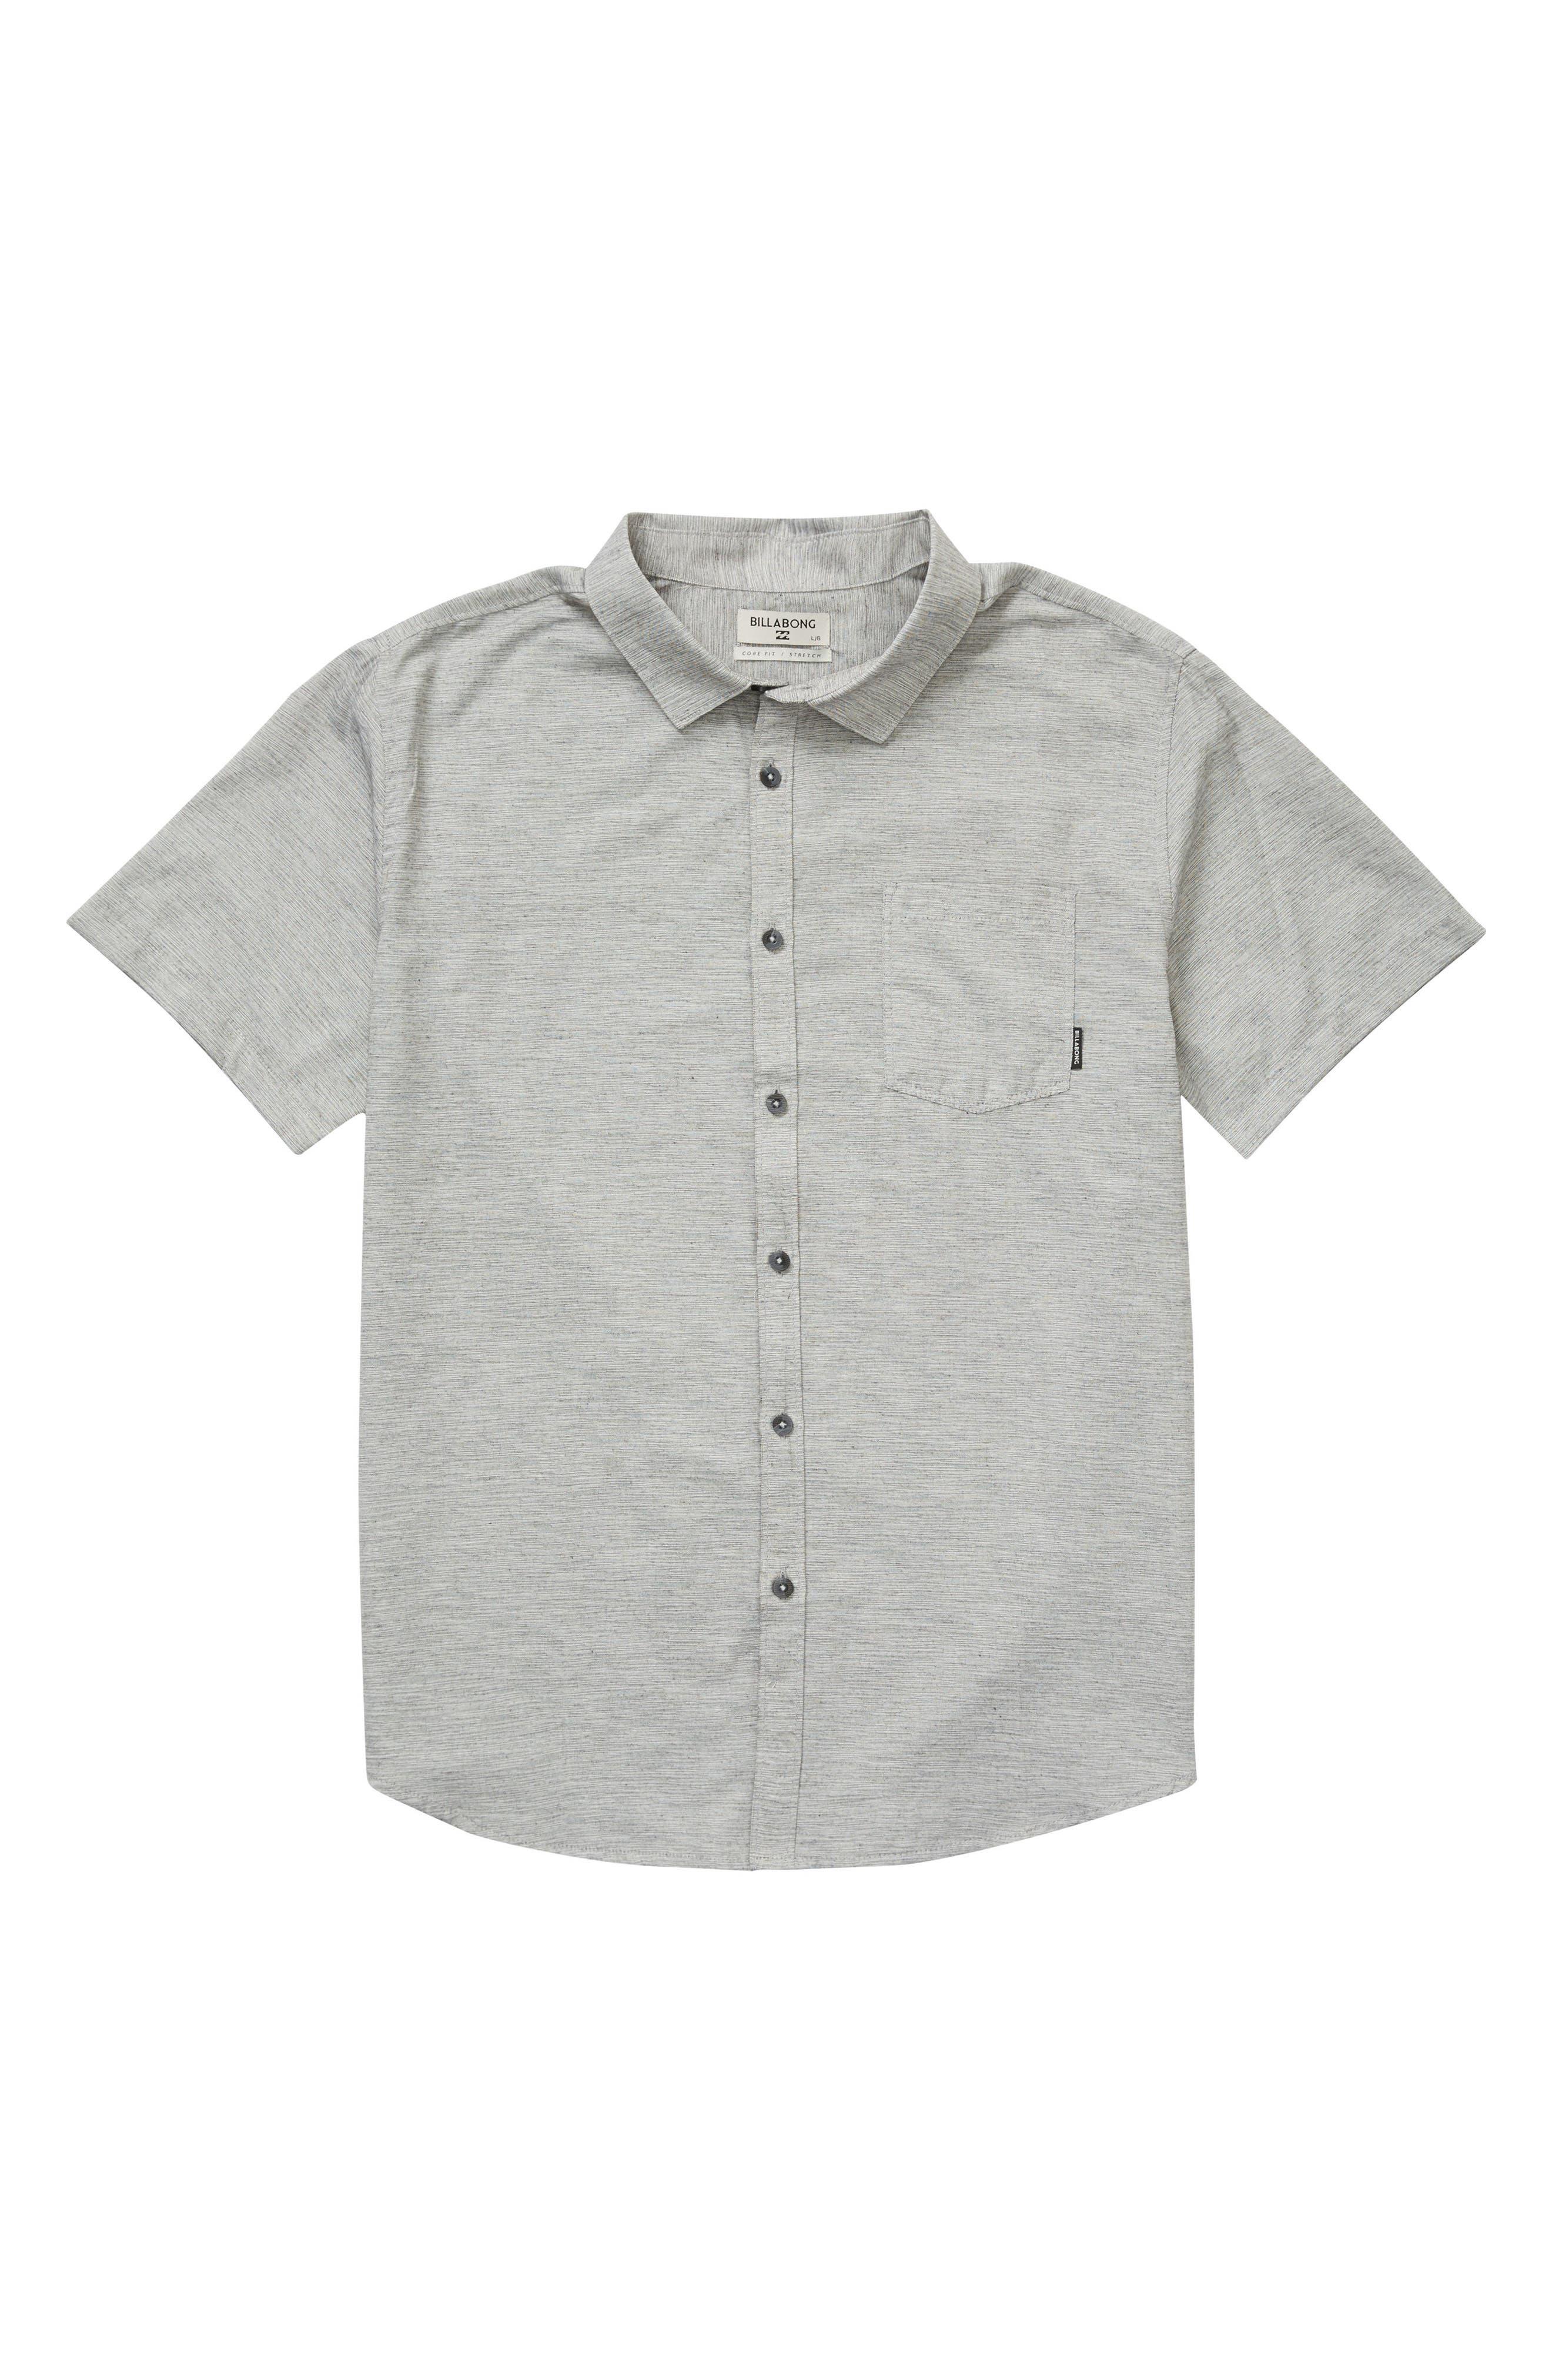 Alternate Image 1 Selected - Billabong All Day Helix Woven Shirt (Big Boys)